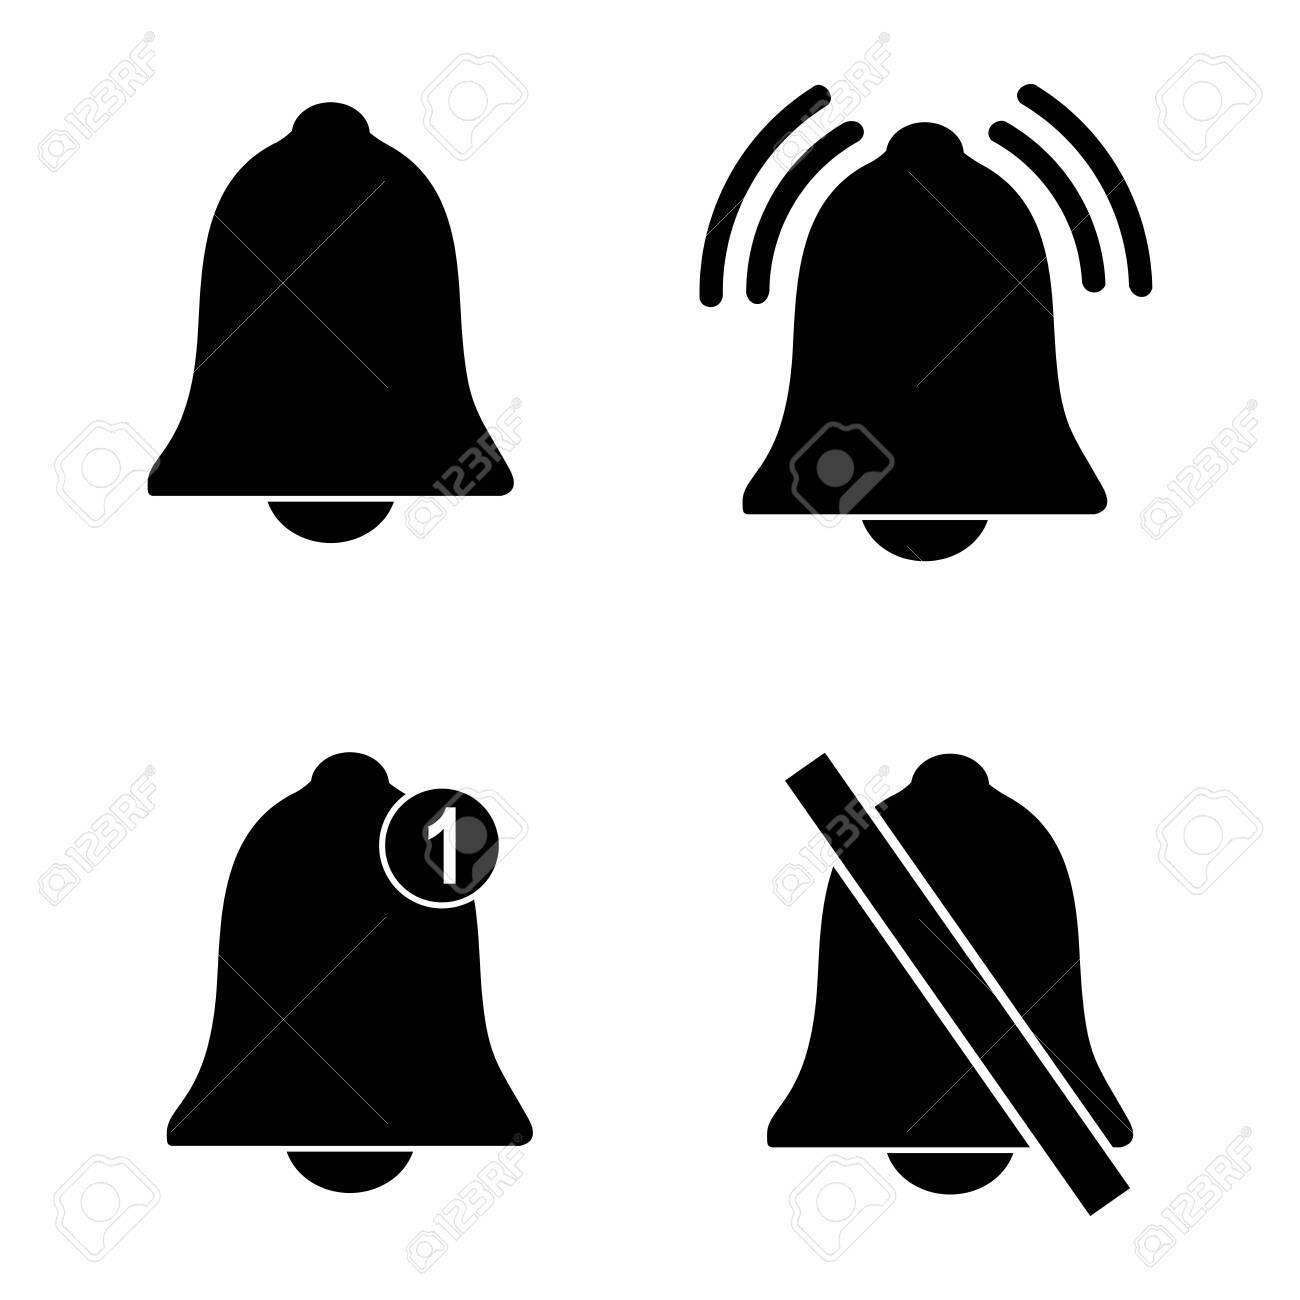 notification icon,bell notification, social media notification icon vector design symbol - 141379442